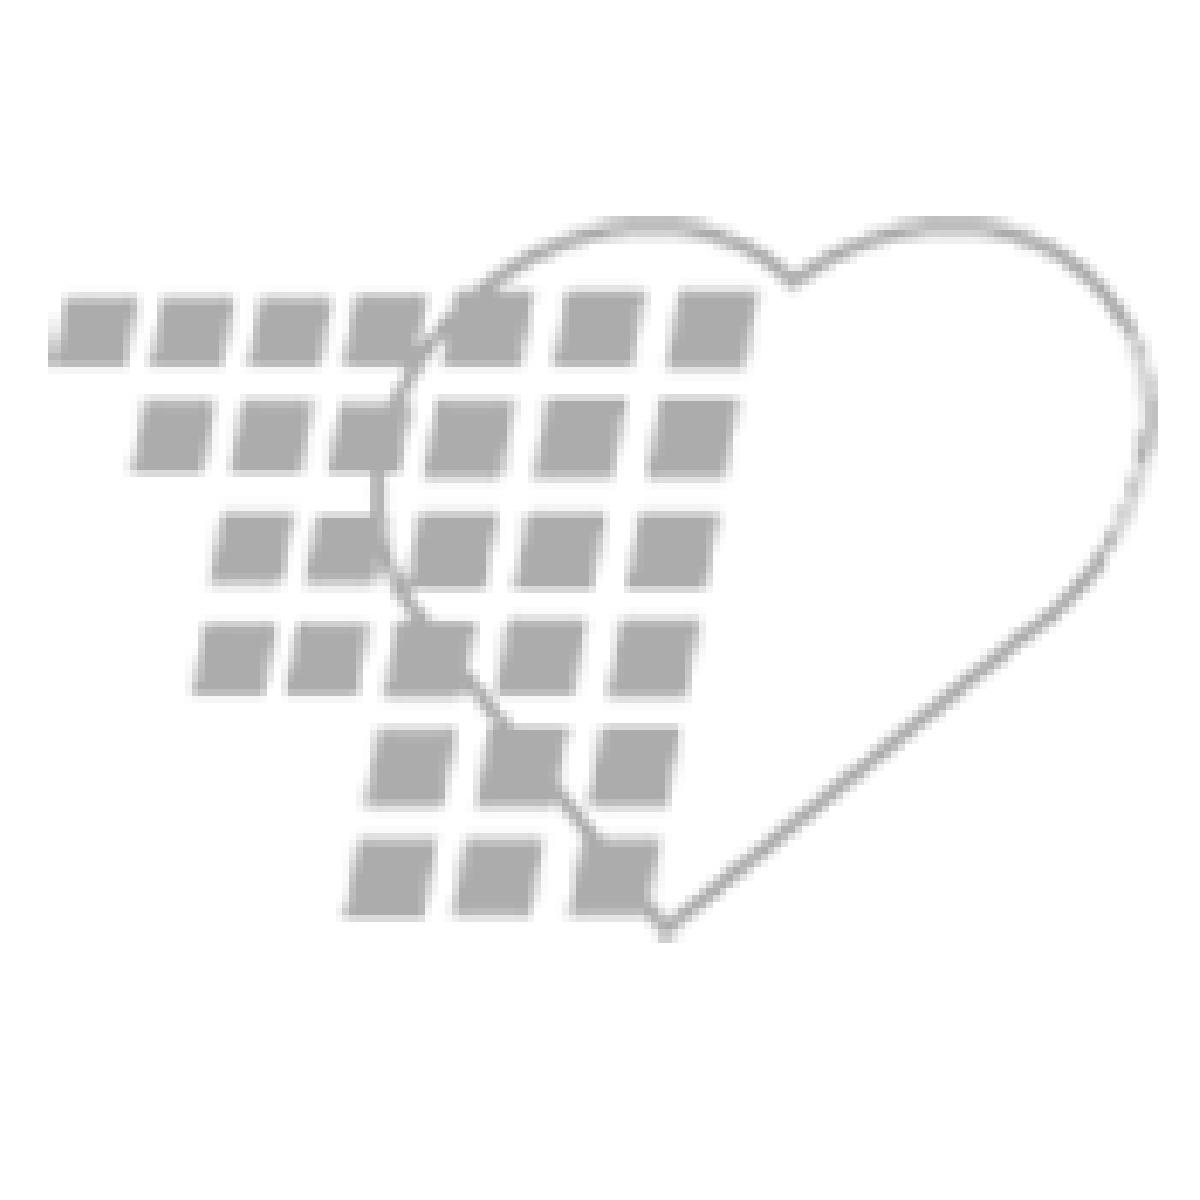 07-71-0610 Tracheostomy Care Kit Latex Free